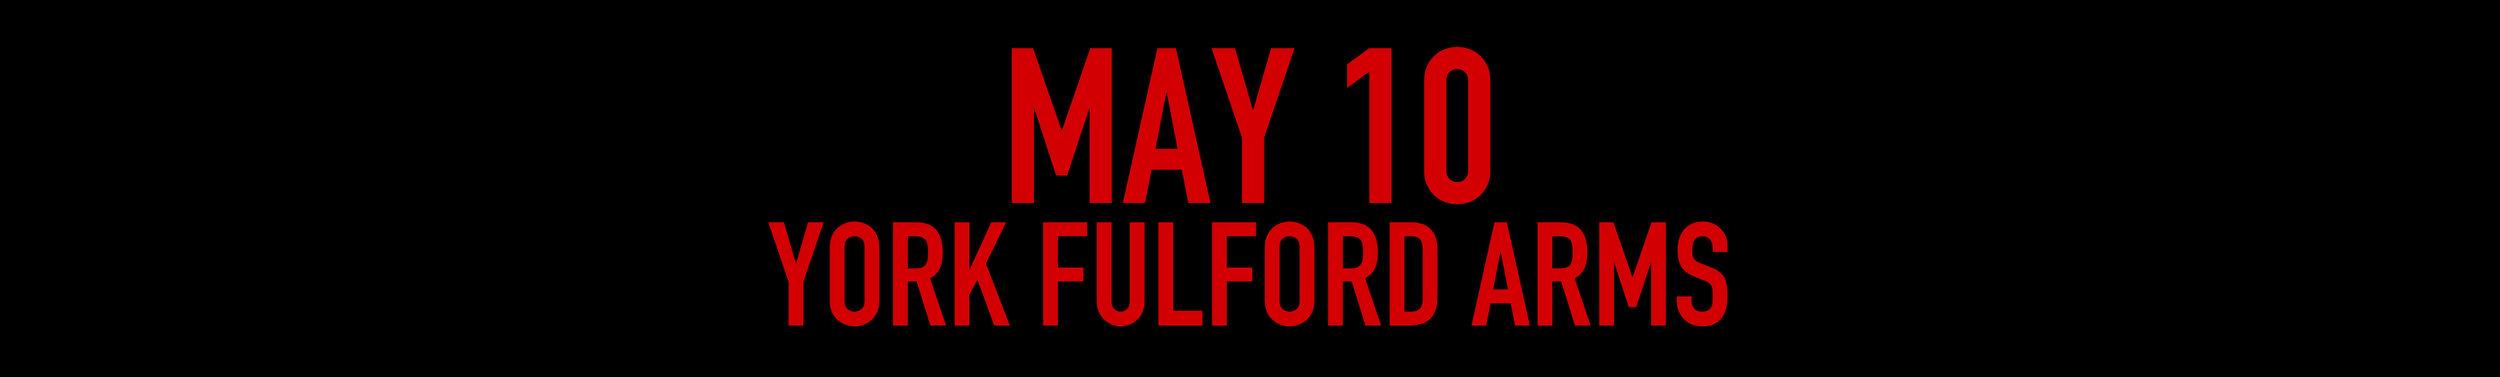 MAY 10 RRC YORK FULFORD ARMS.jpg